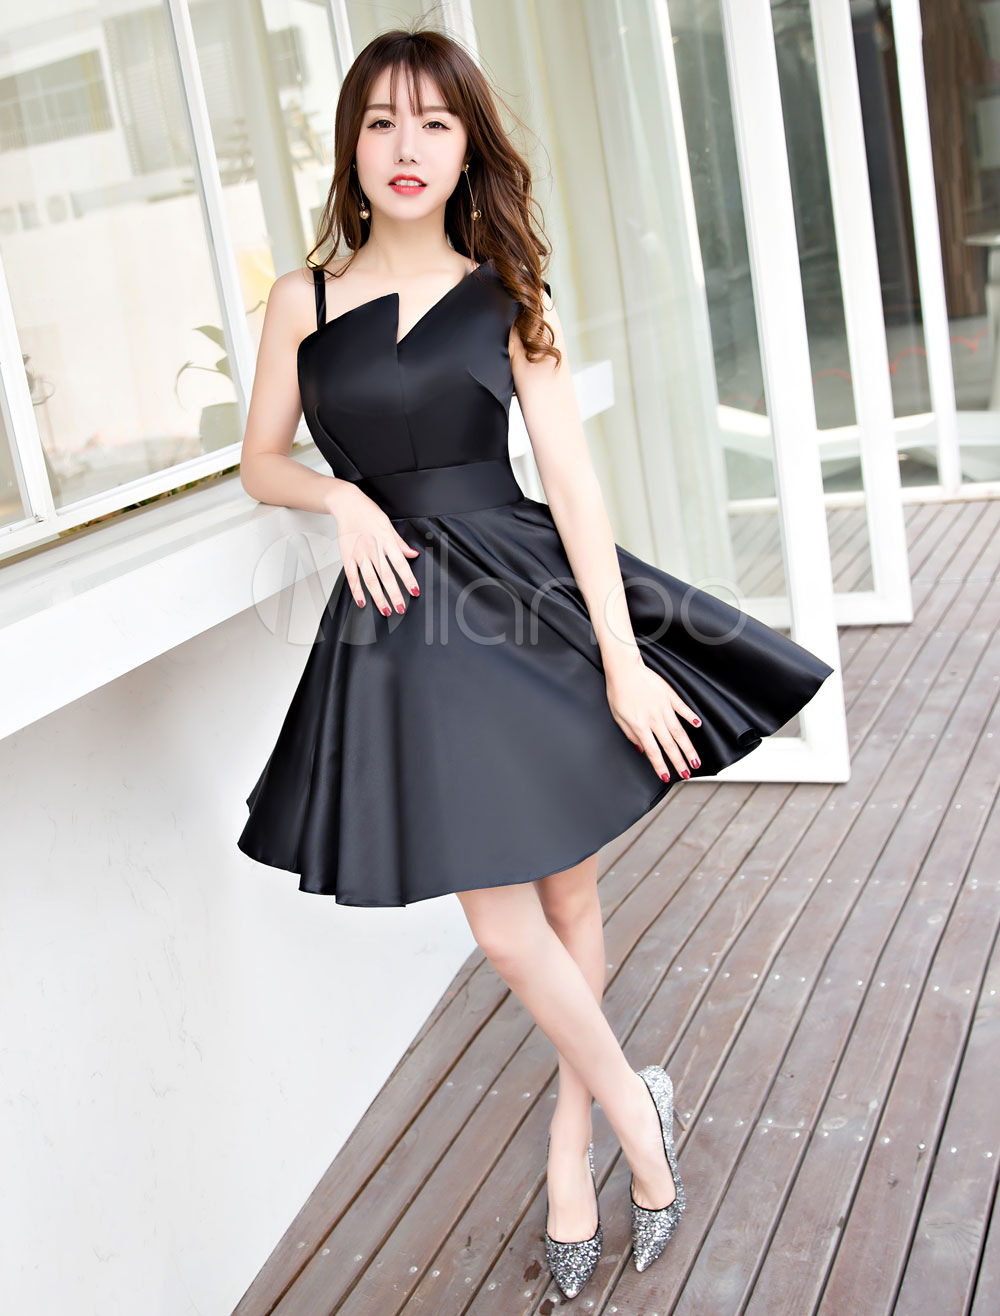 56b52a77a3668 Little Black Dresses Satin A Line Asymmetrical Neckline Short ...